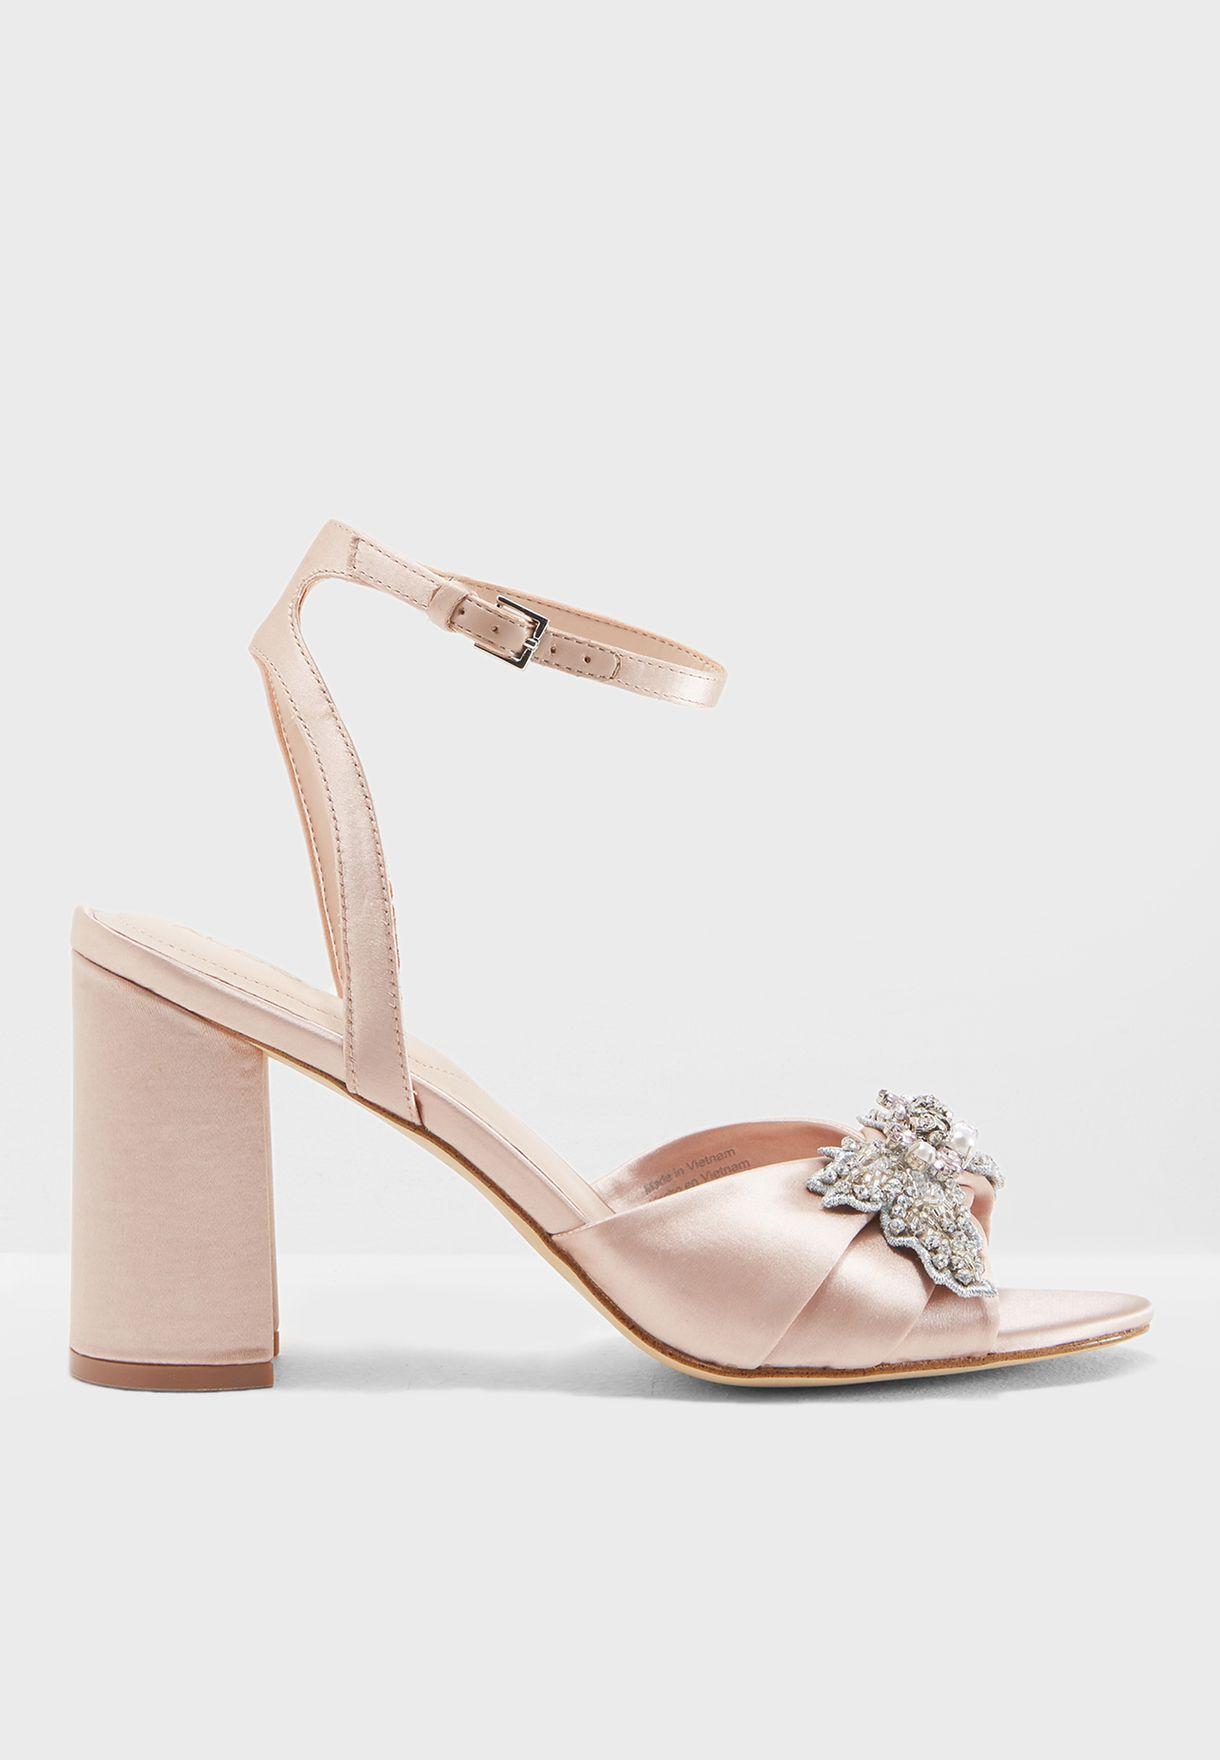 c8cc7124437 Shop Aldo neutrals Mid Heel Block Sandal SANSPERATE55 for Women in ...